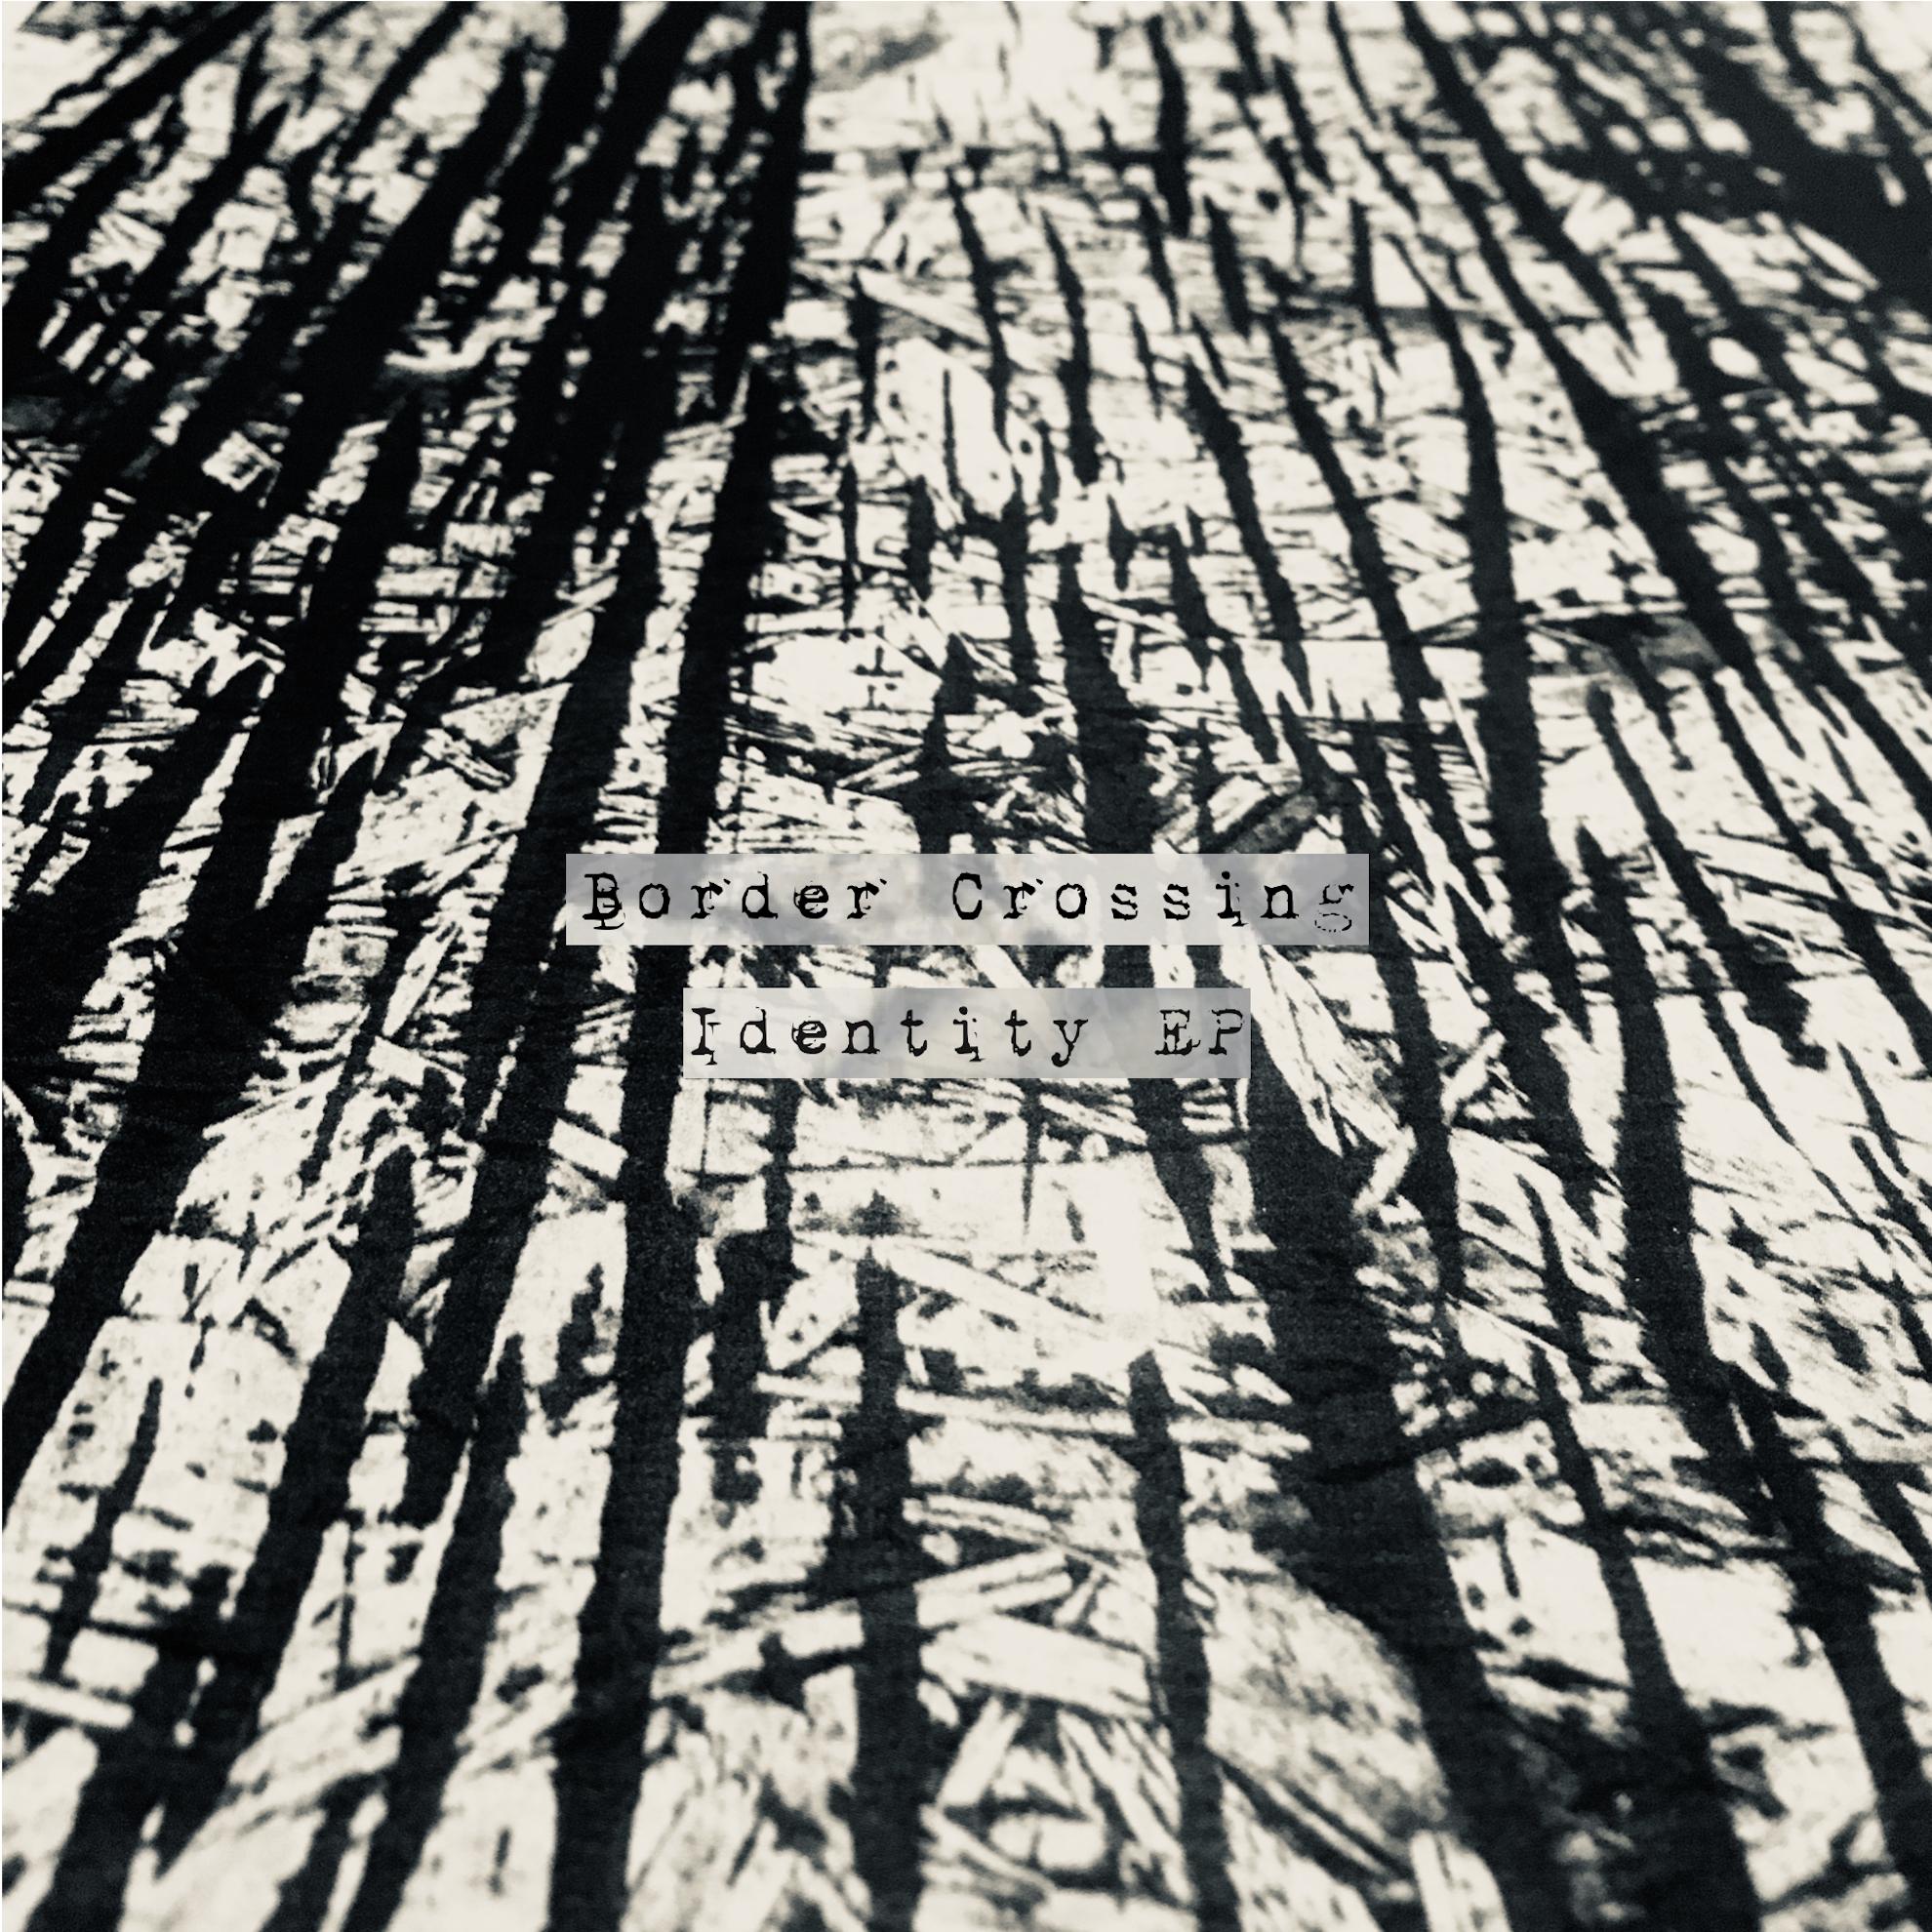 B77009-Identity EP.jpg